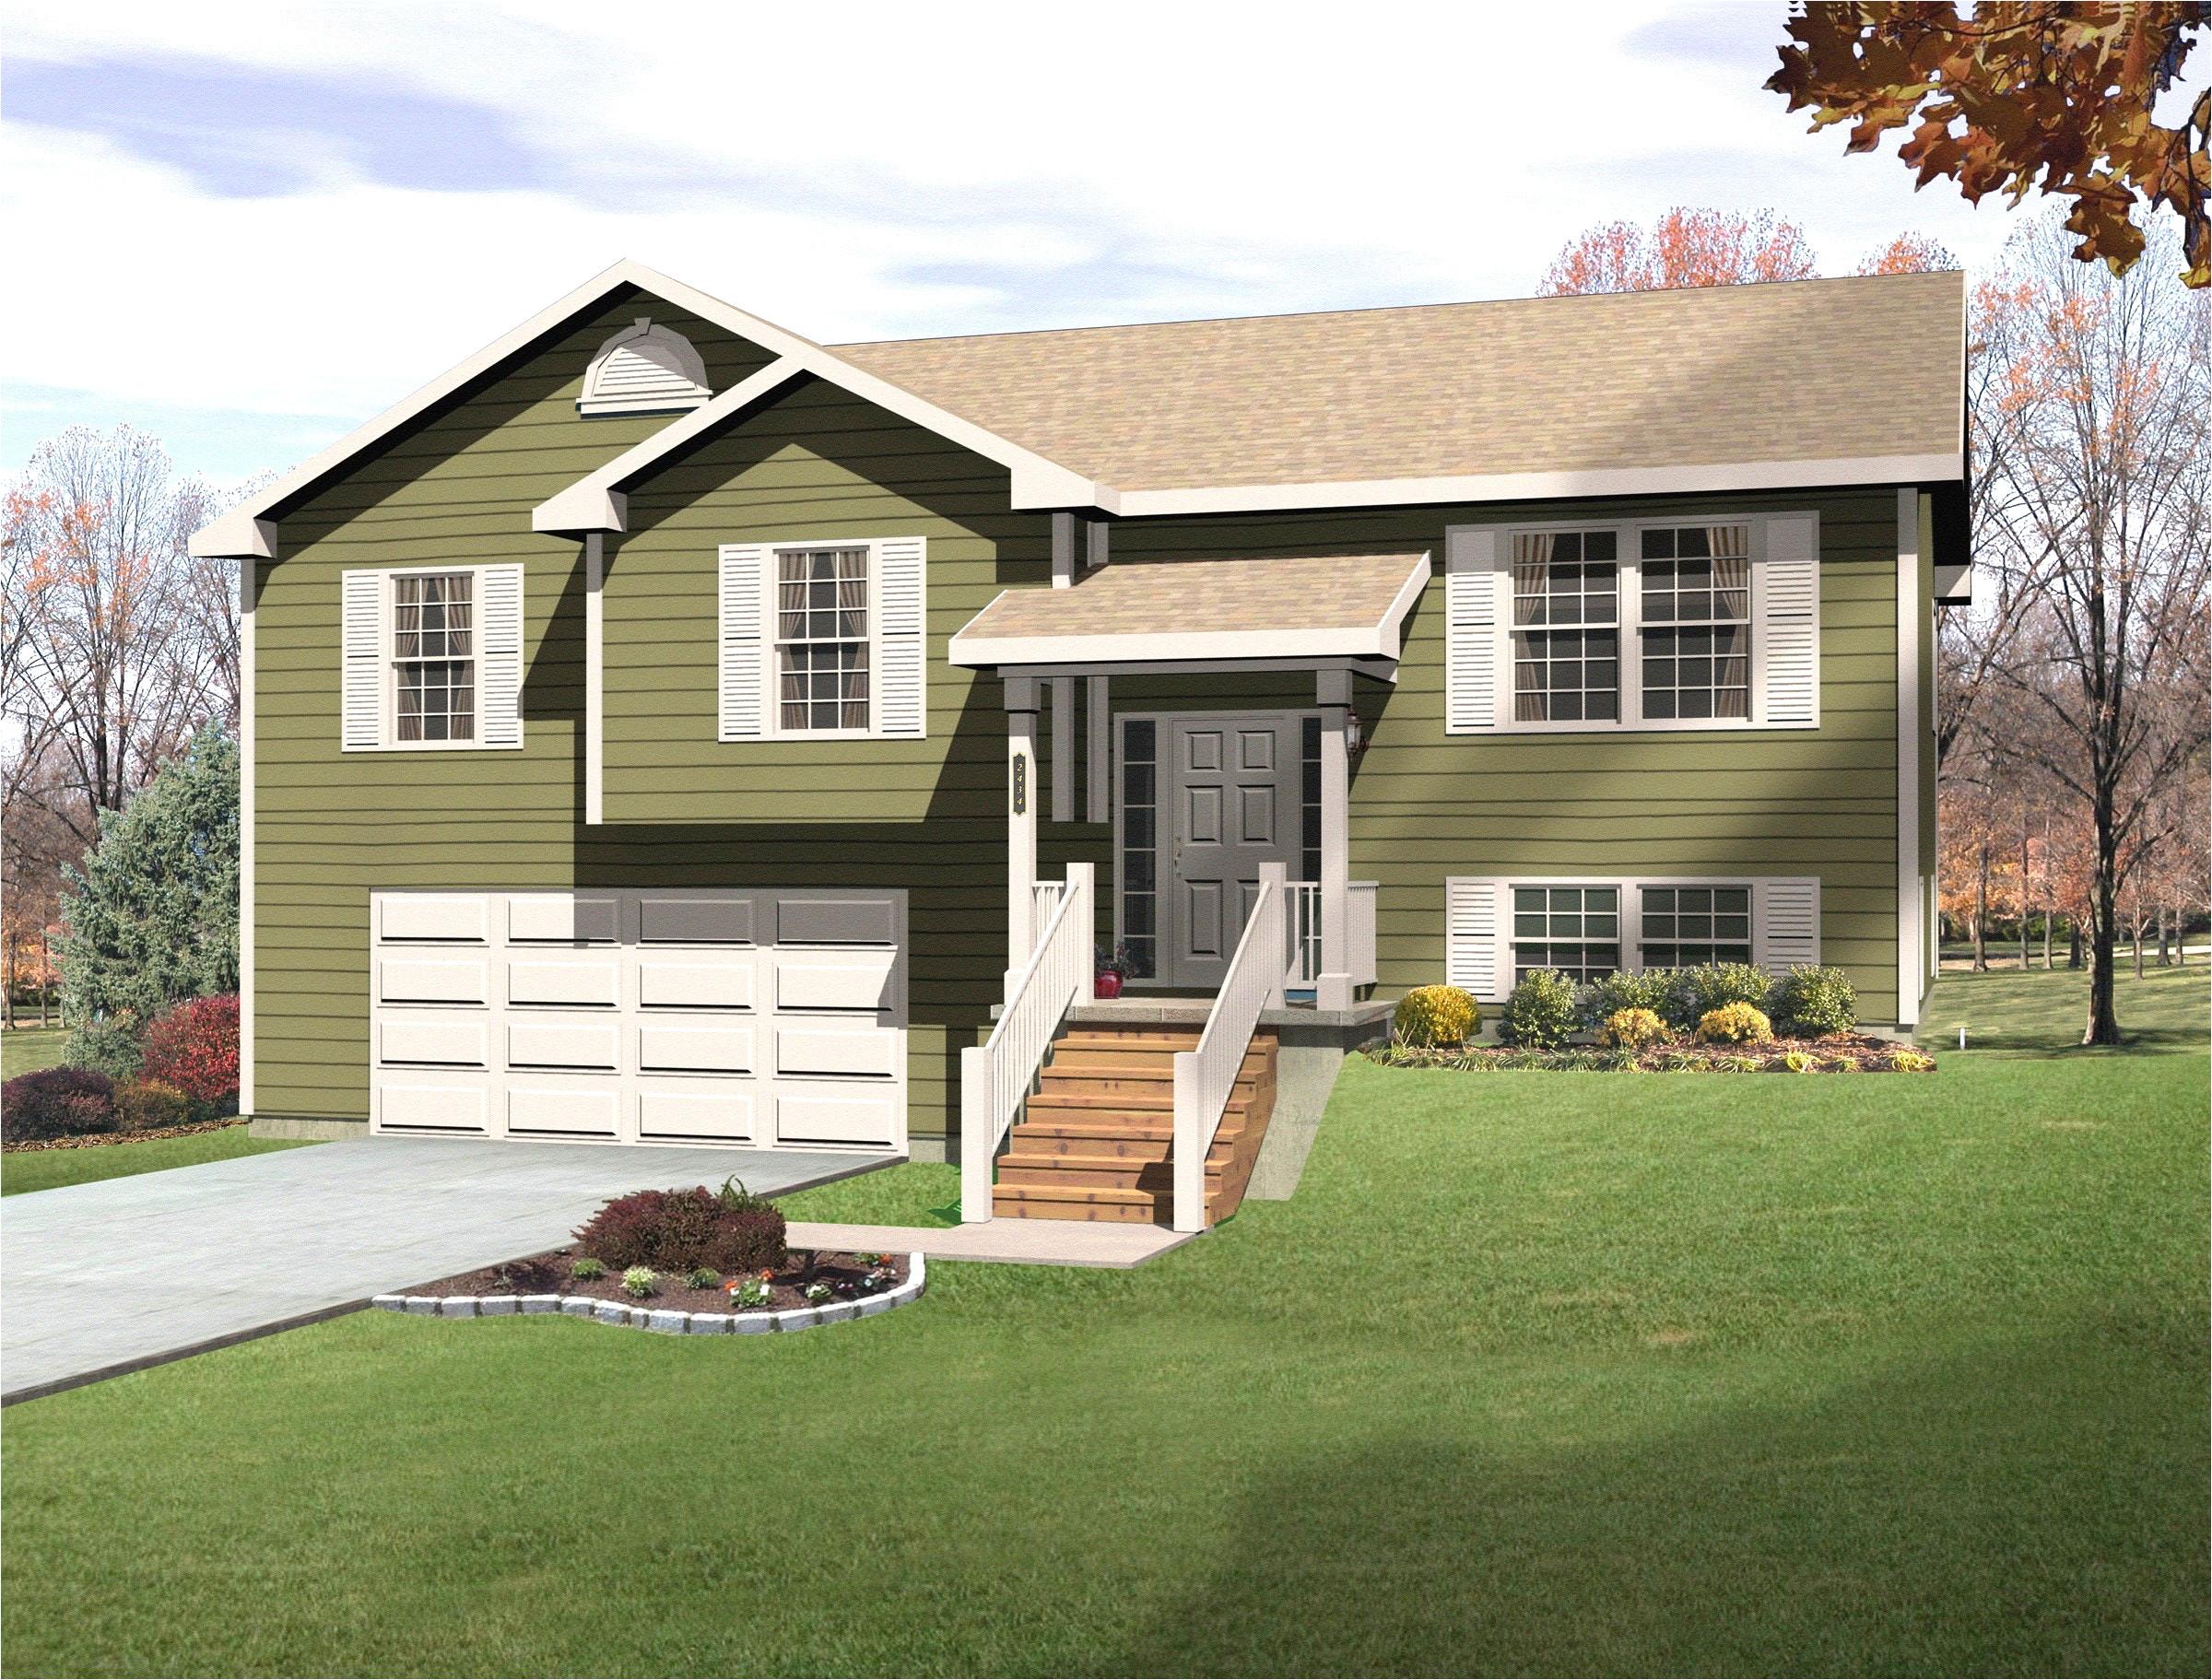 new split level house plans with walkout basement home design split home designs